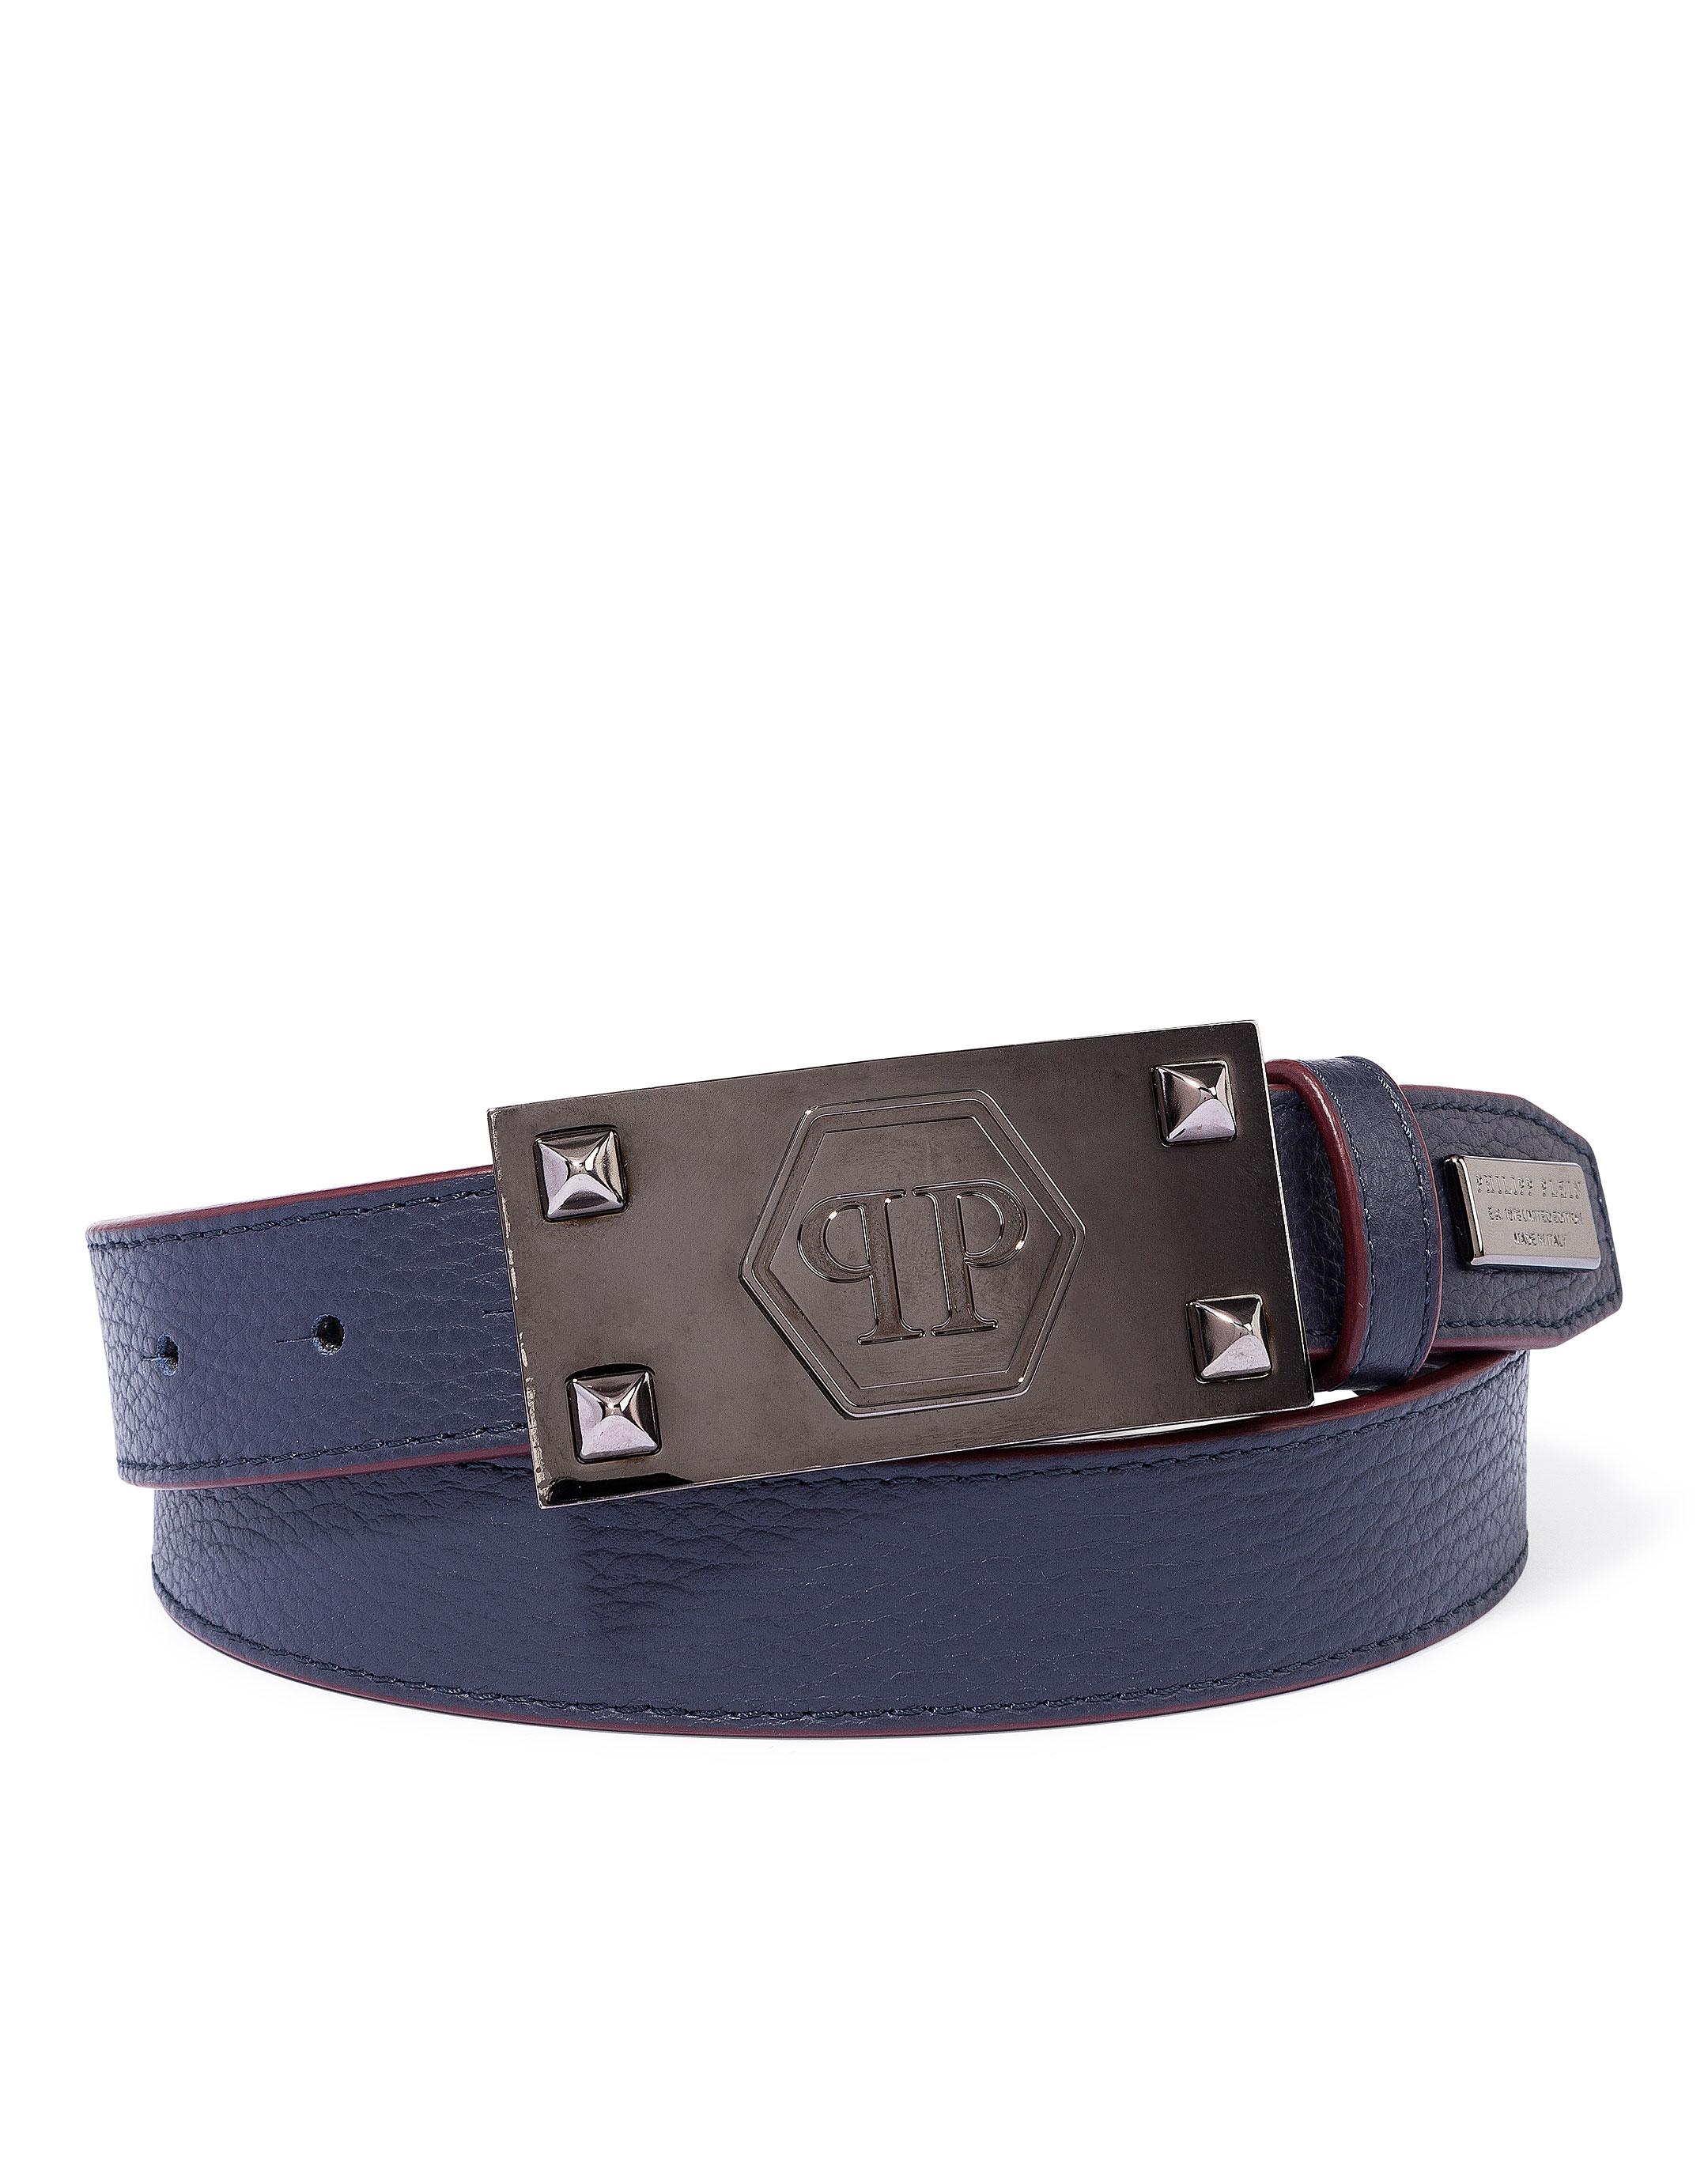 belt rich two philipp plein outlet. Black Bedroom Furniture Sets. Home Design Ideas